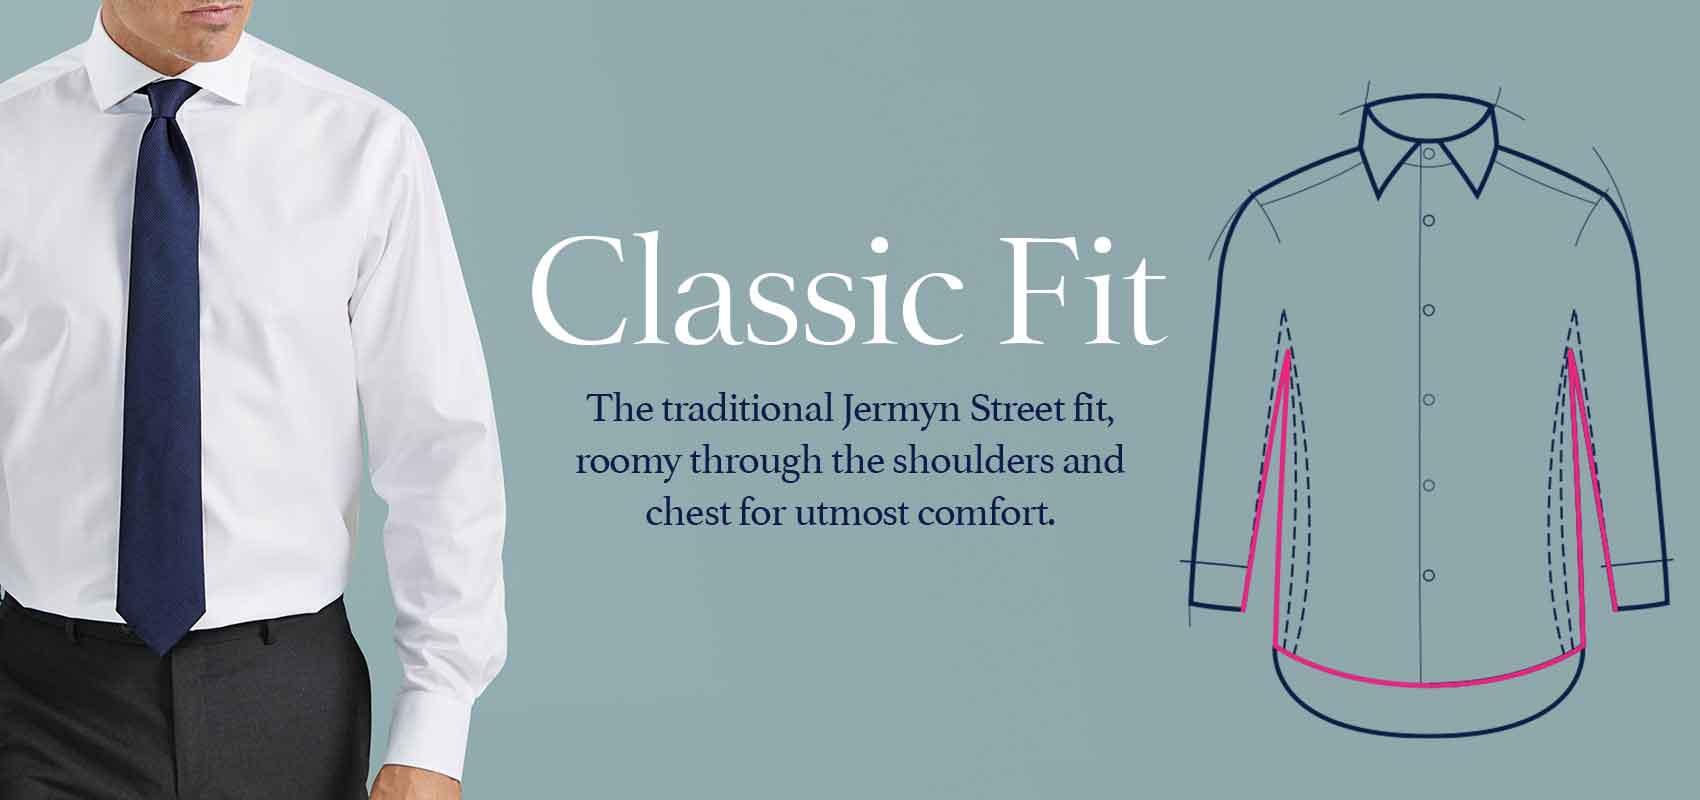 Classic fit shirts